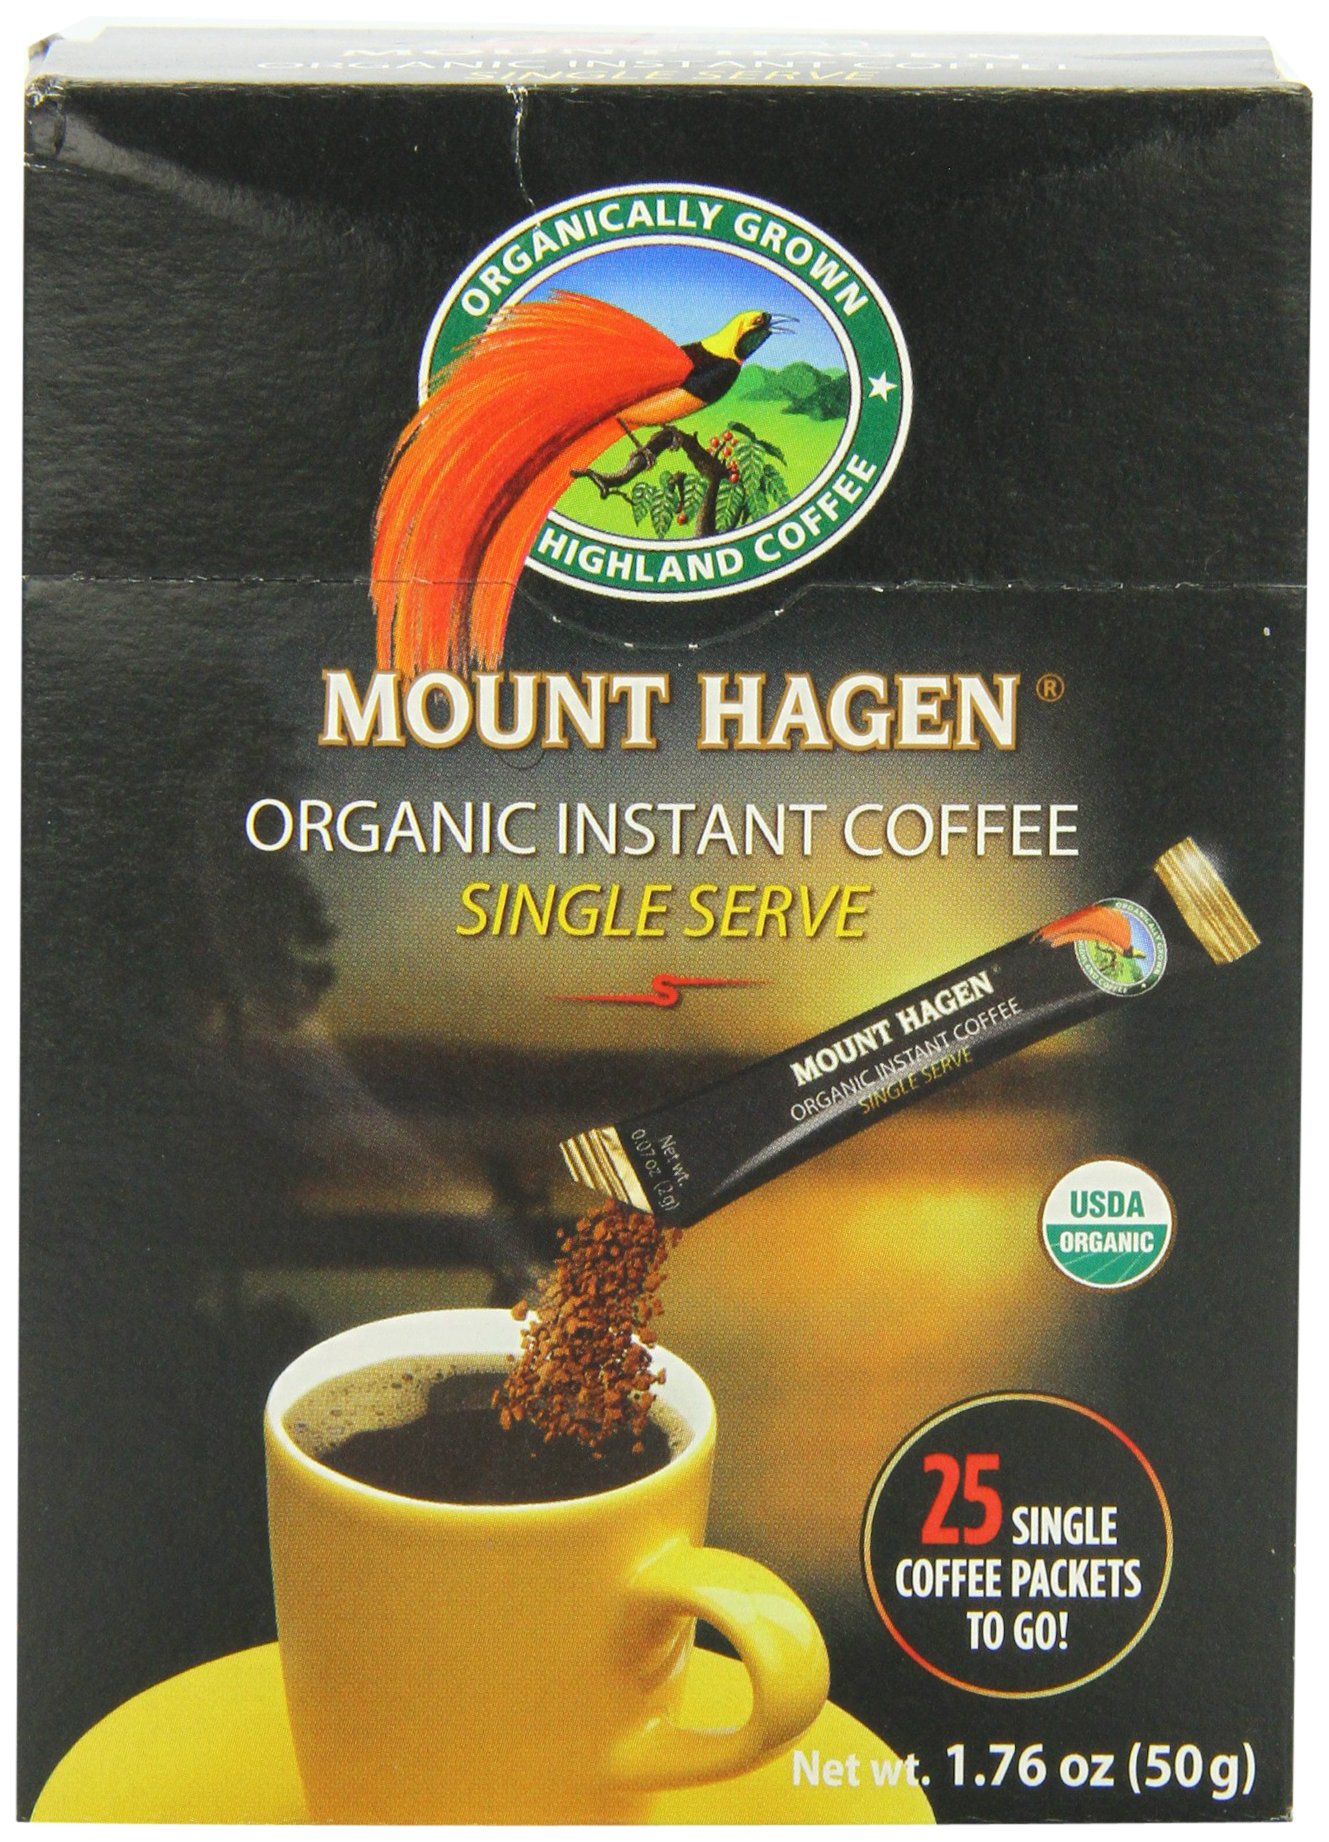 Mount Hagen Organic Instant Regular Coffee, 25-Count Single Serve packets (Pack of 4) by Mount Hagen (Image #1)